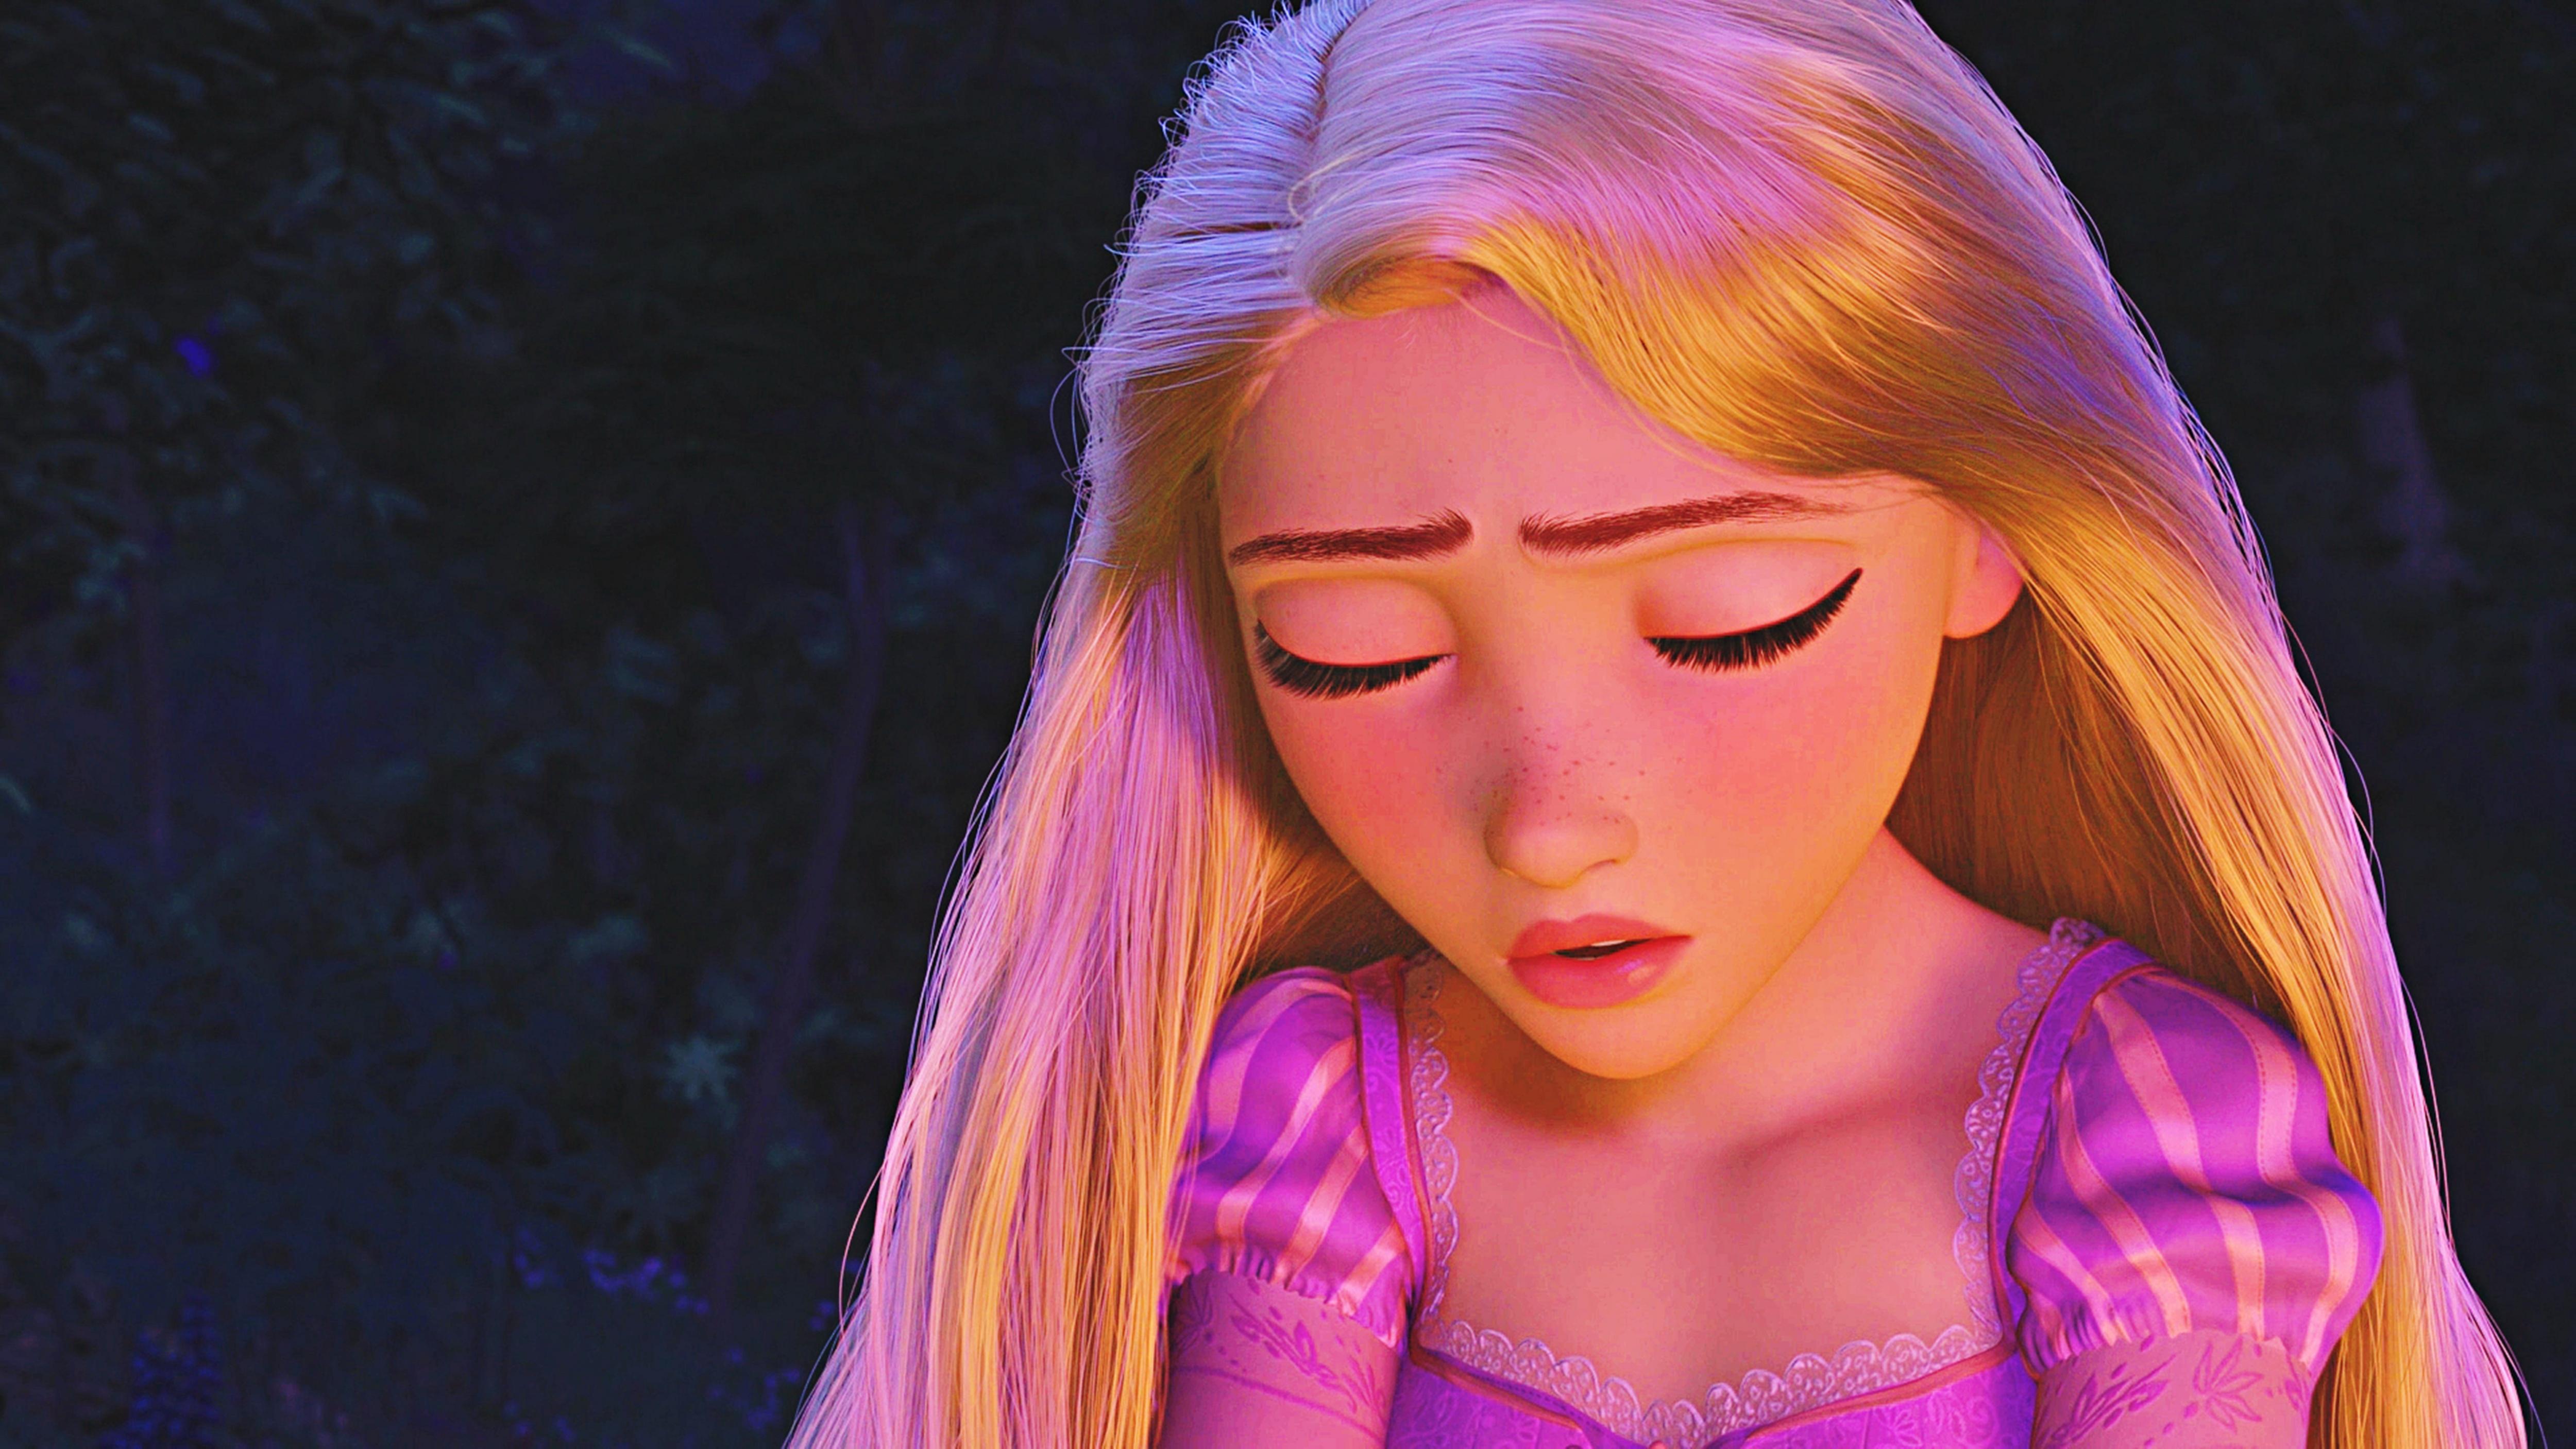 Walt Disney screencaps - Princess Rapunzel - Walt Disney ... Disney Rapunzel Screencaps